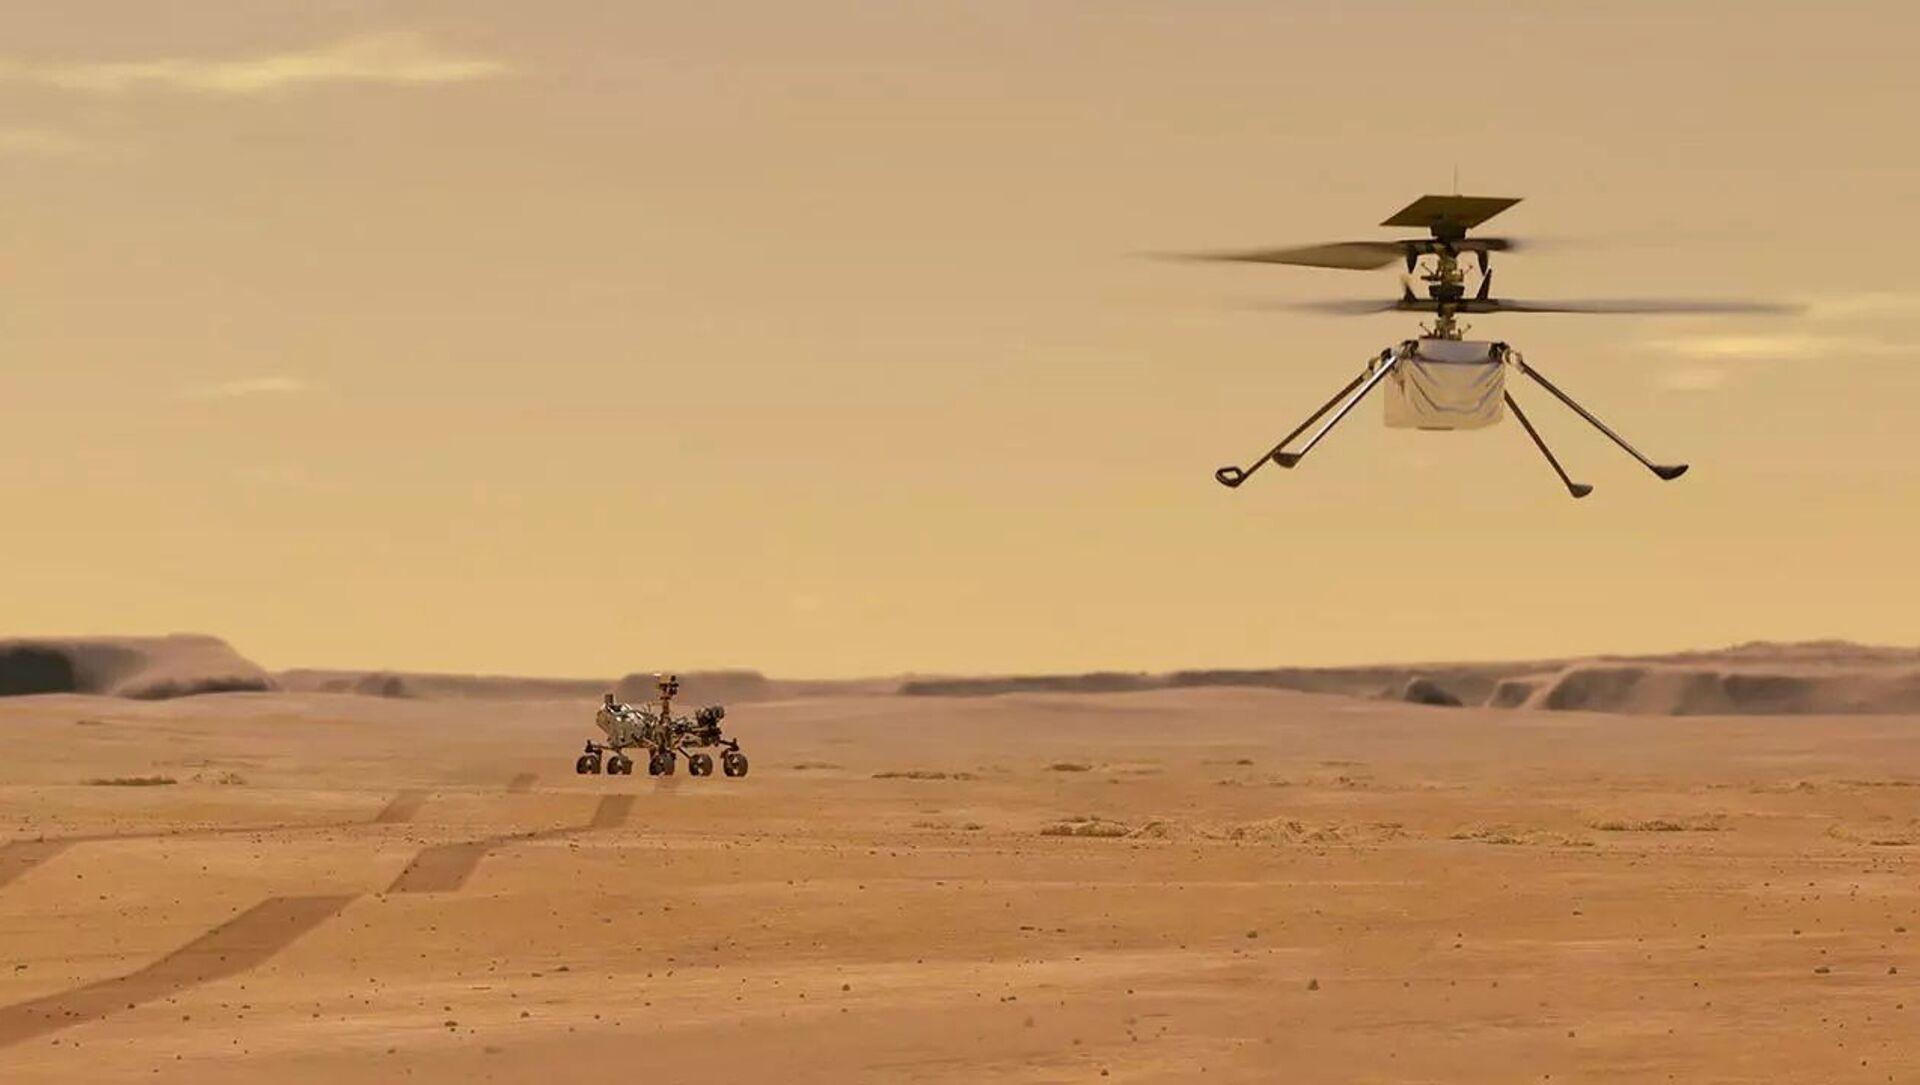 NASAが動画を公開 火星でドローンヘリIngenuityが初飛行 - Sputnik 日本, 1920, 21.04.2021